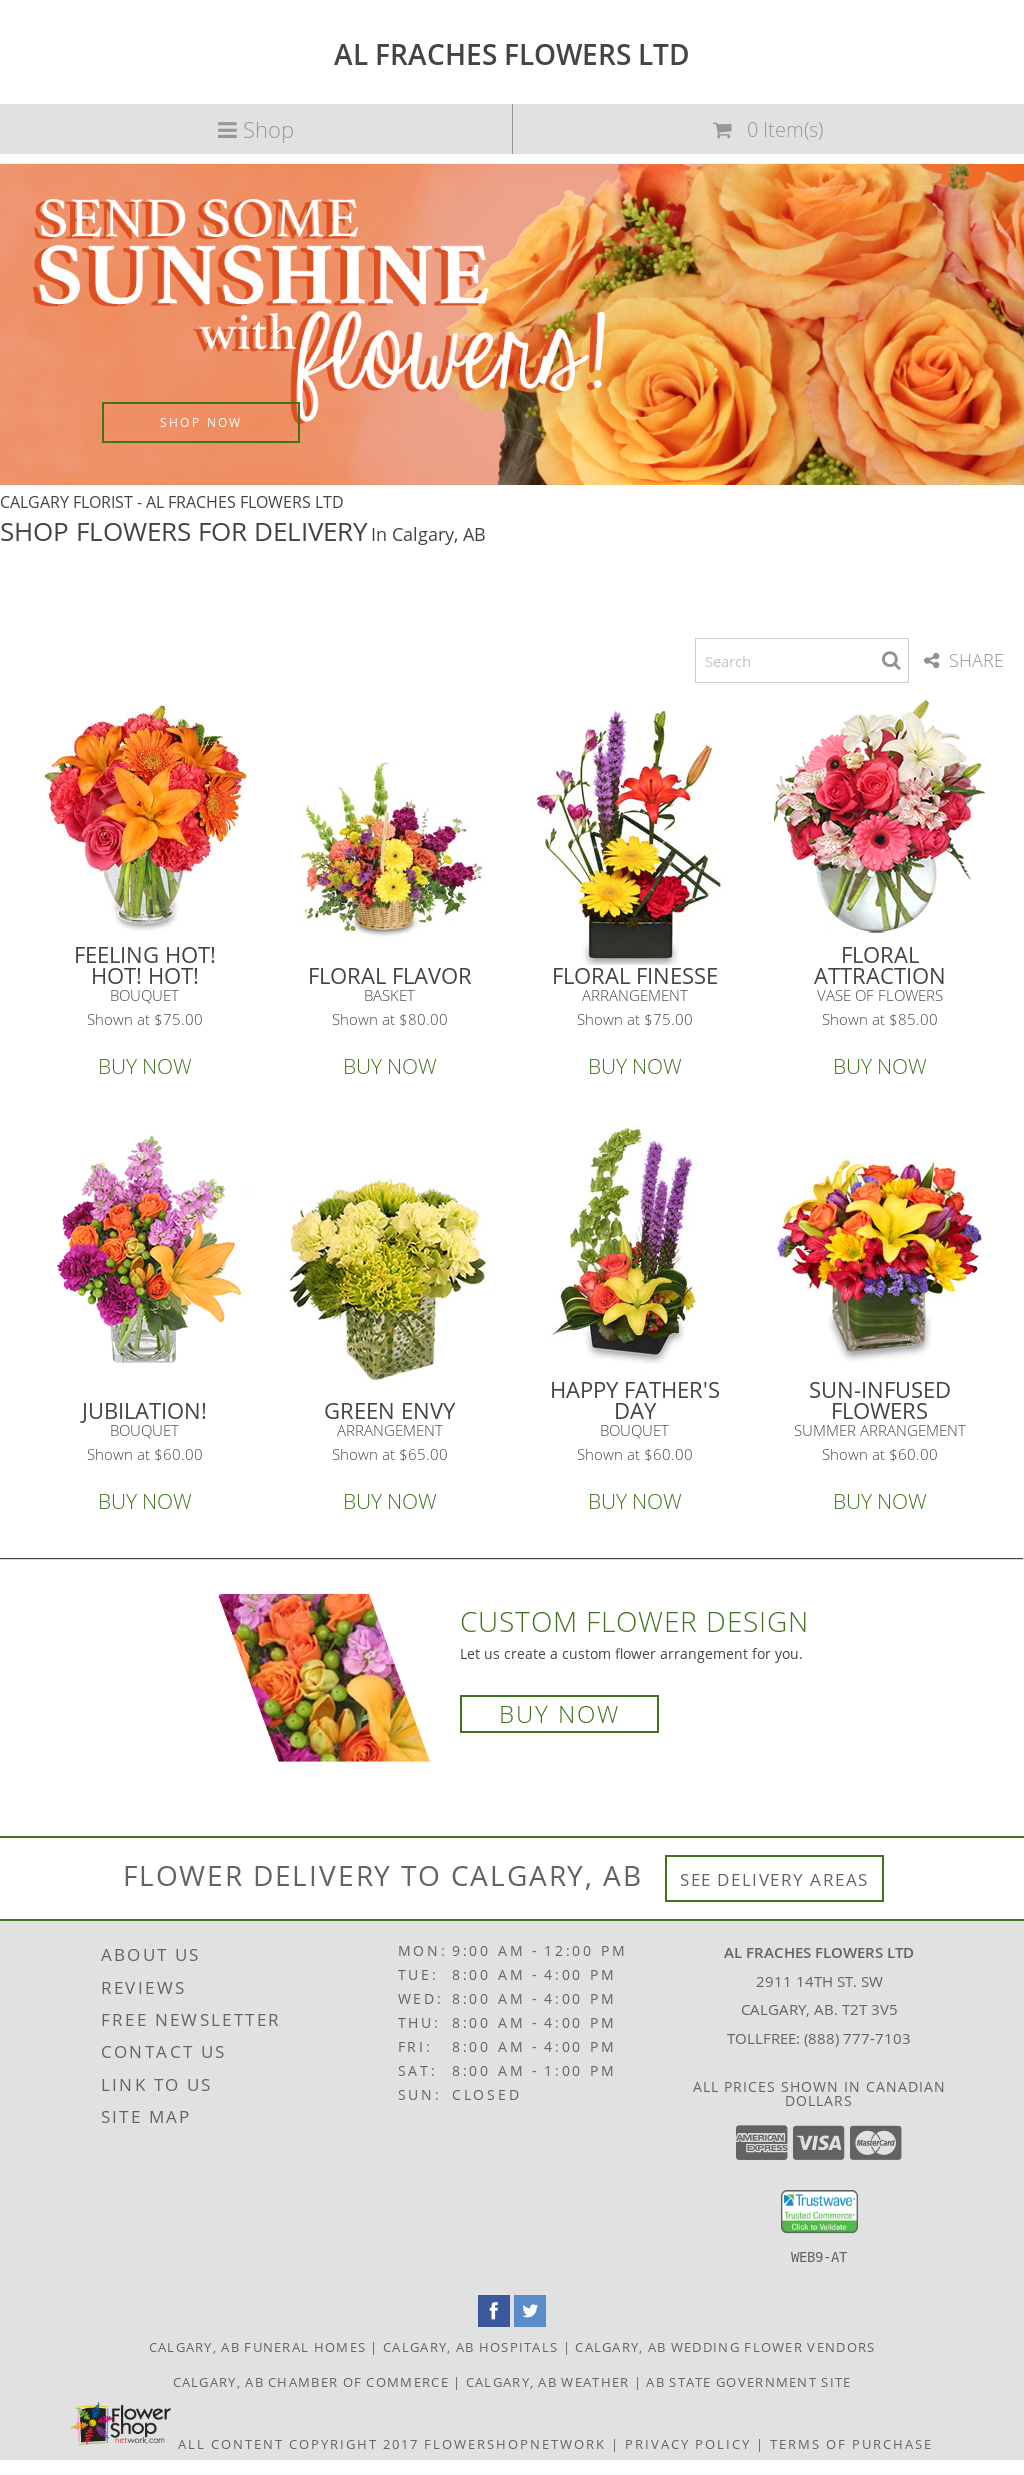 Al fraches flowers calgary competitors revenue and employees al fraches flowers calgary website history izmirmasajfo